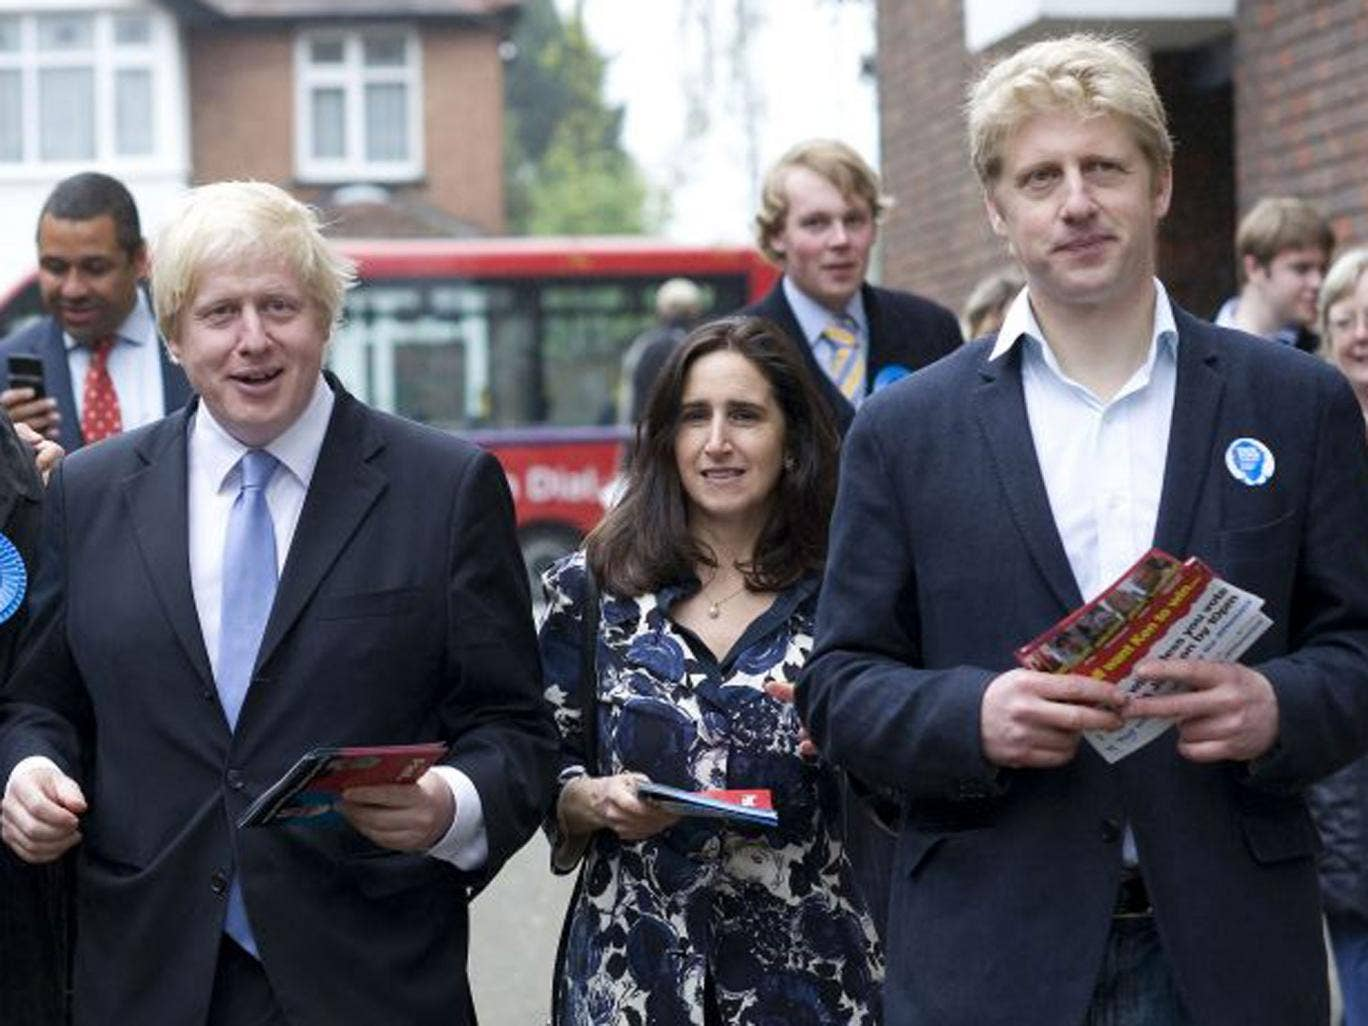 London Mayor Boris Johnson, with his wife Marina Wheeler and brother Joe, campaigning in Orpington